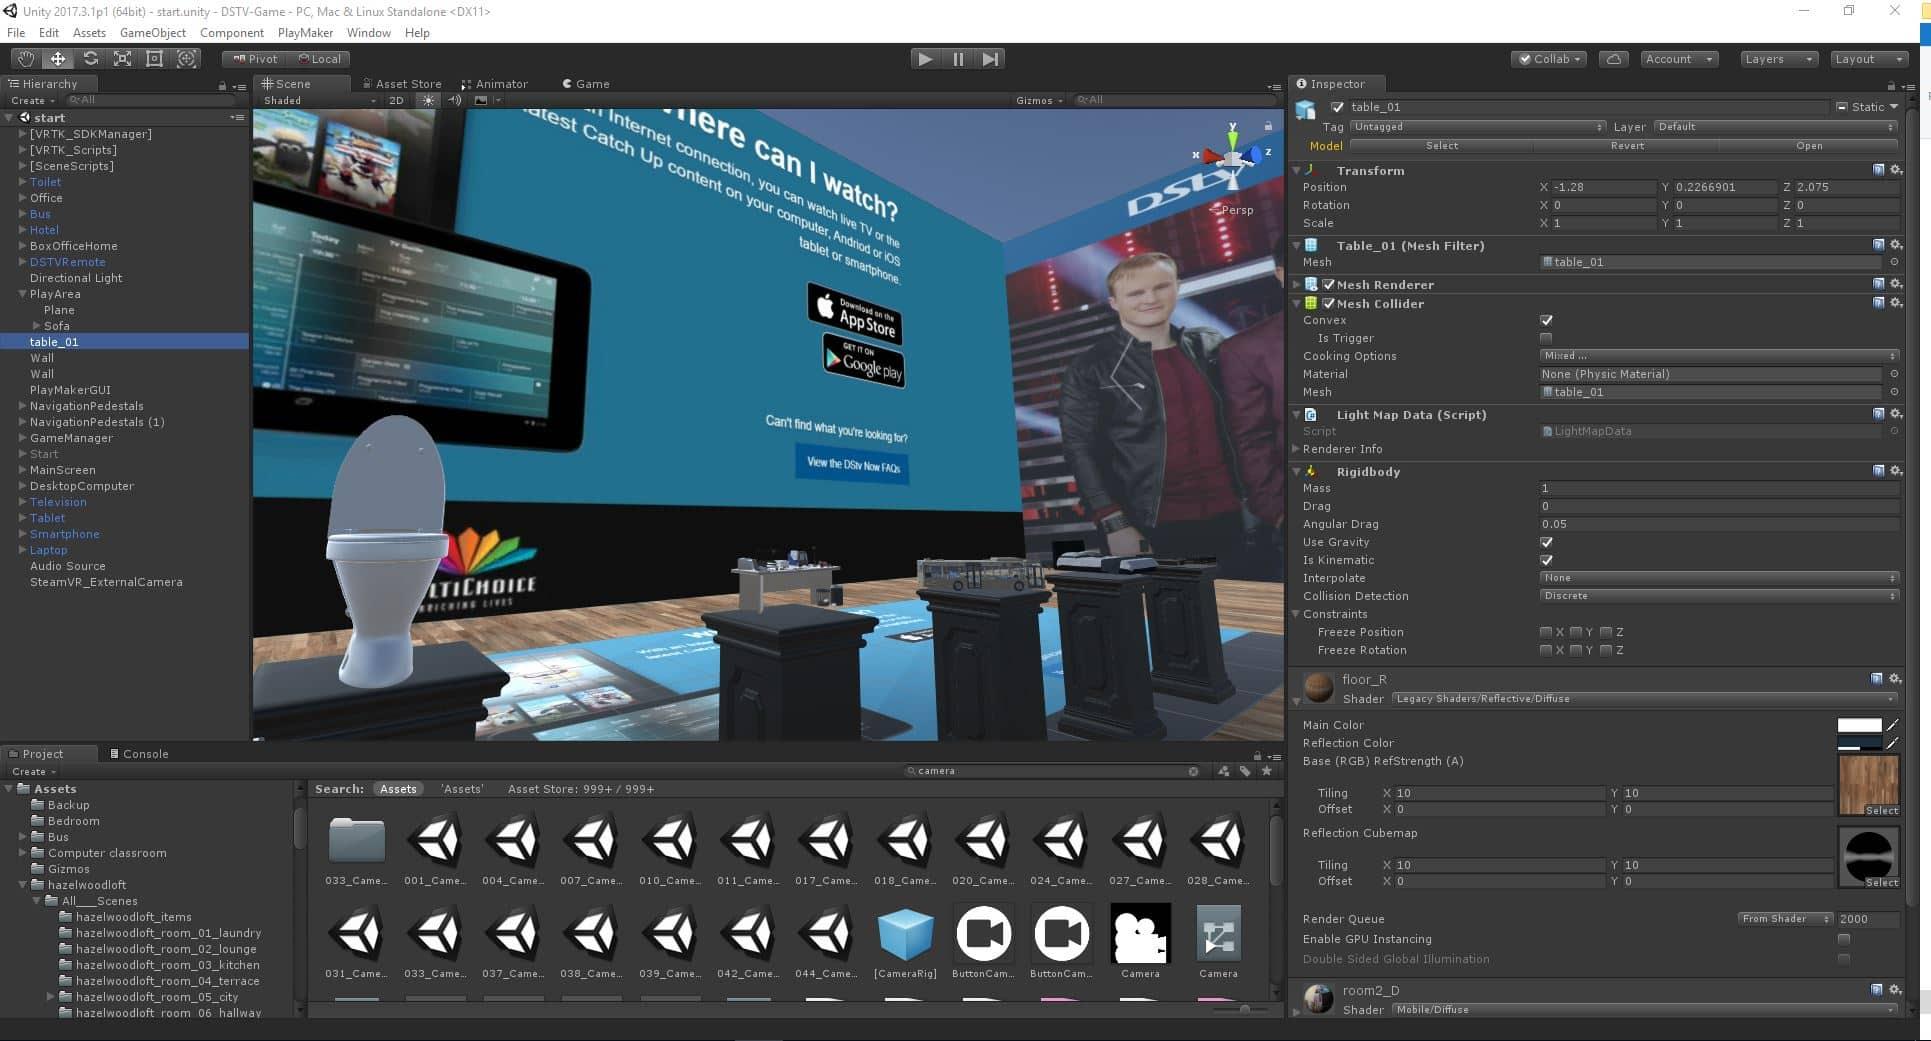 DTSV-virtual-reality-game